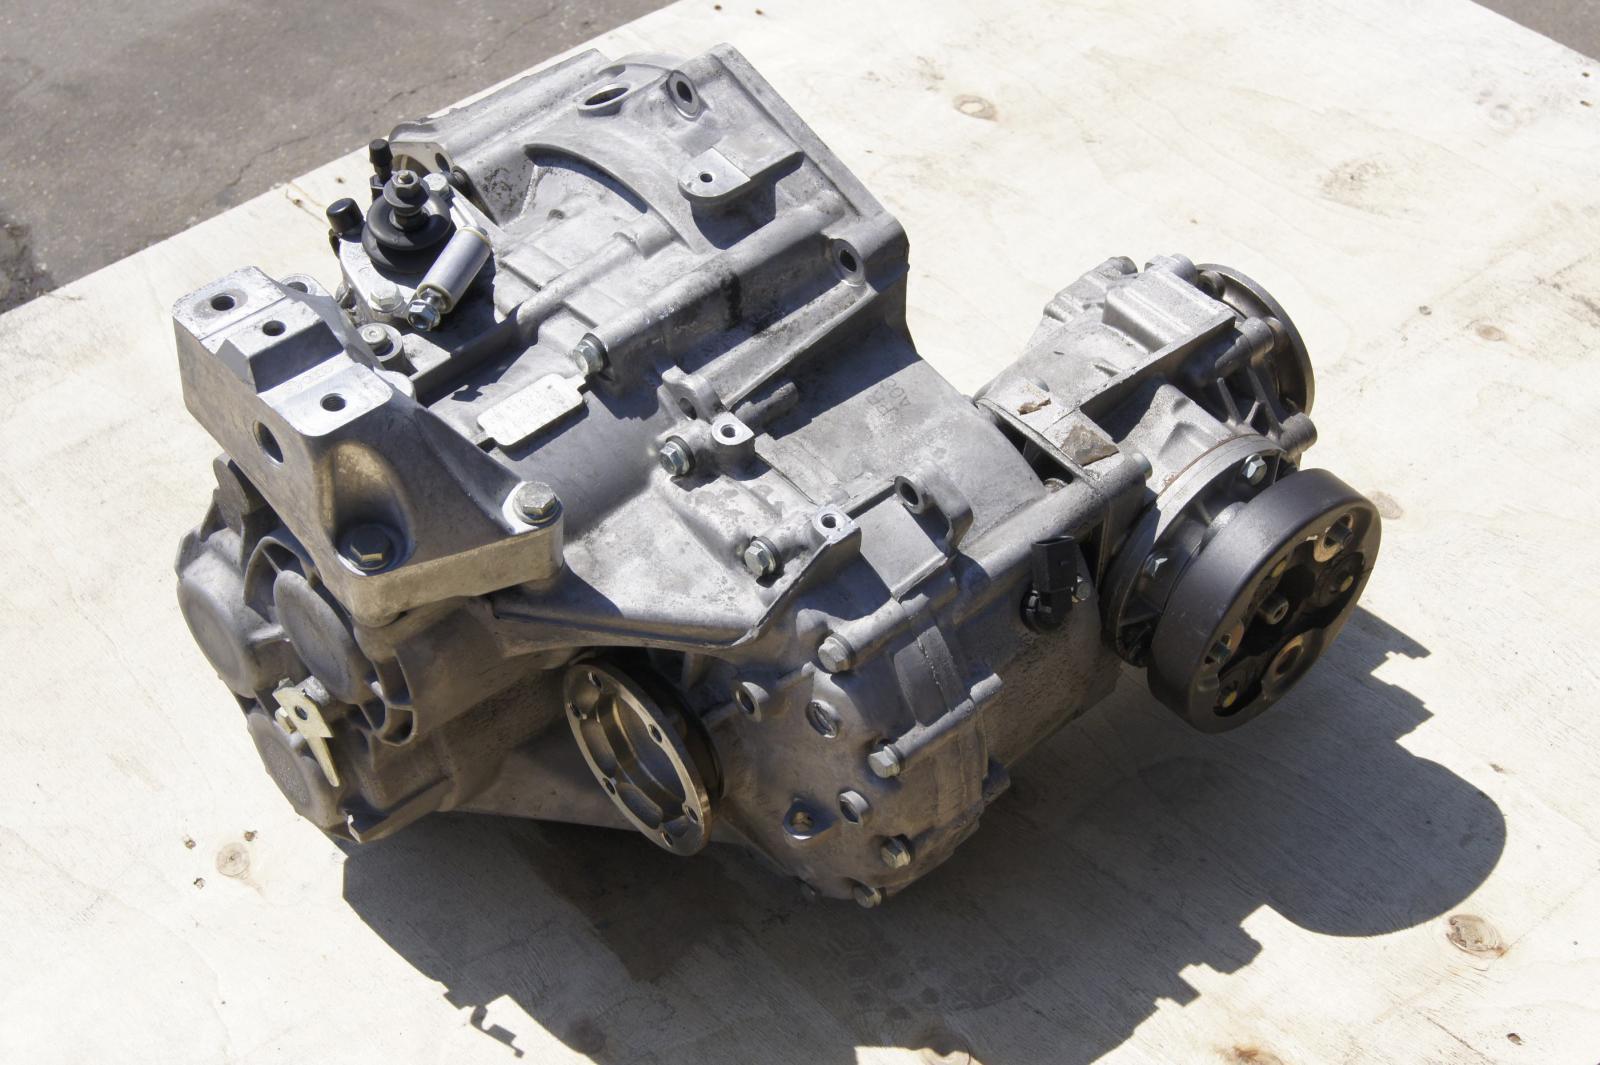 Audi S3 1 8 8l    Audi Tt 1 8 8n 6 Speed Manual Transmission    Gearbox Fmn Code